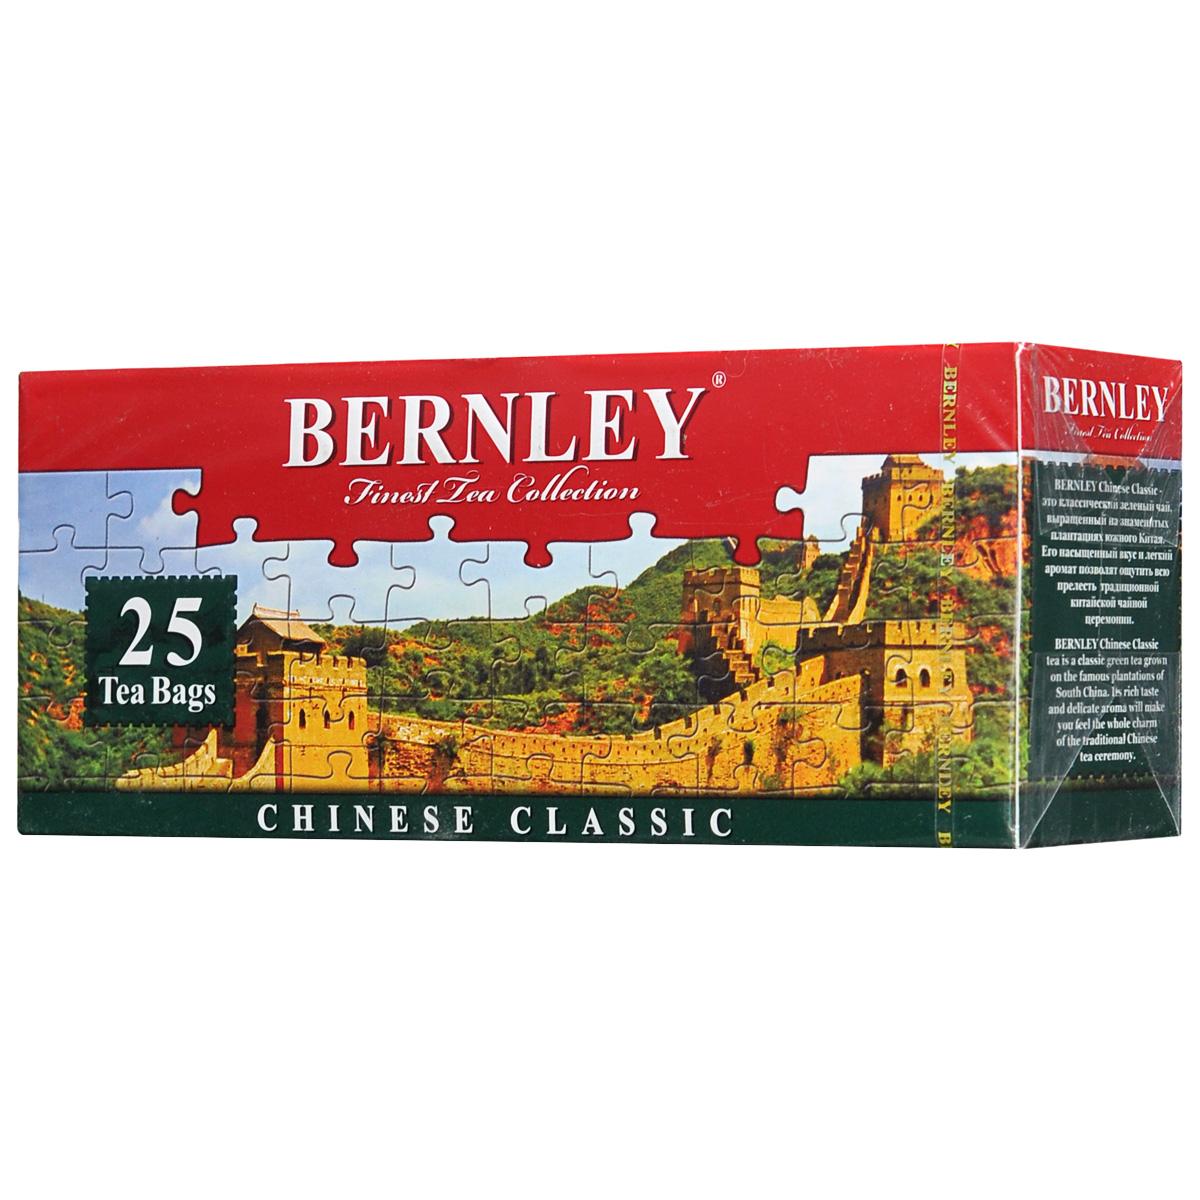 Bernley Chinese Classic зеленый чай в пакетиках, 25 шт